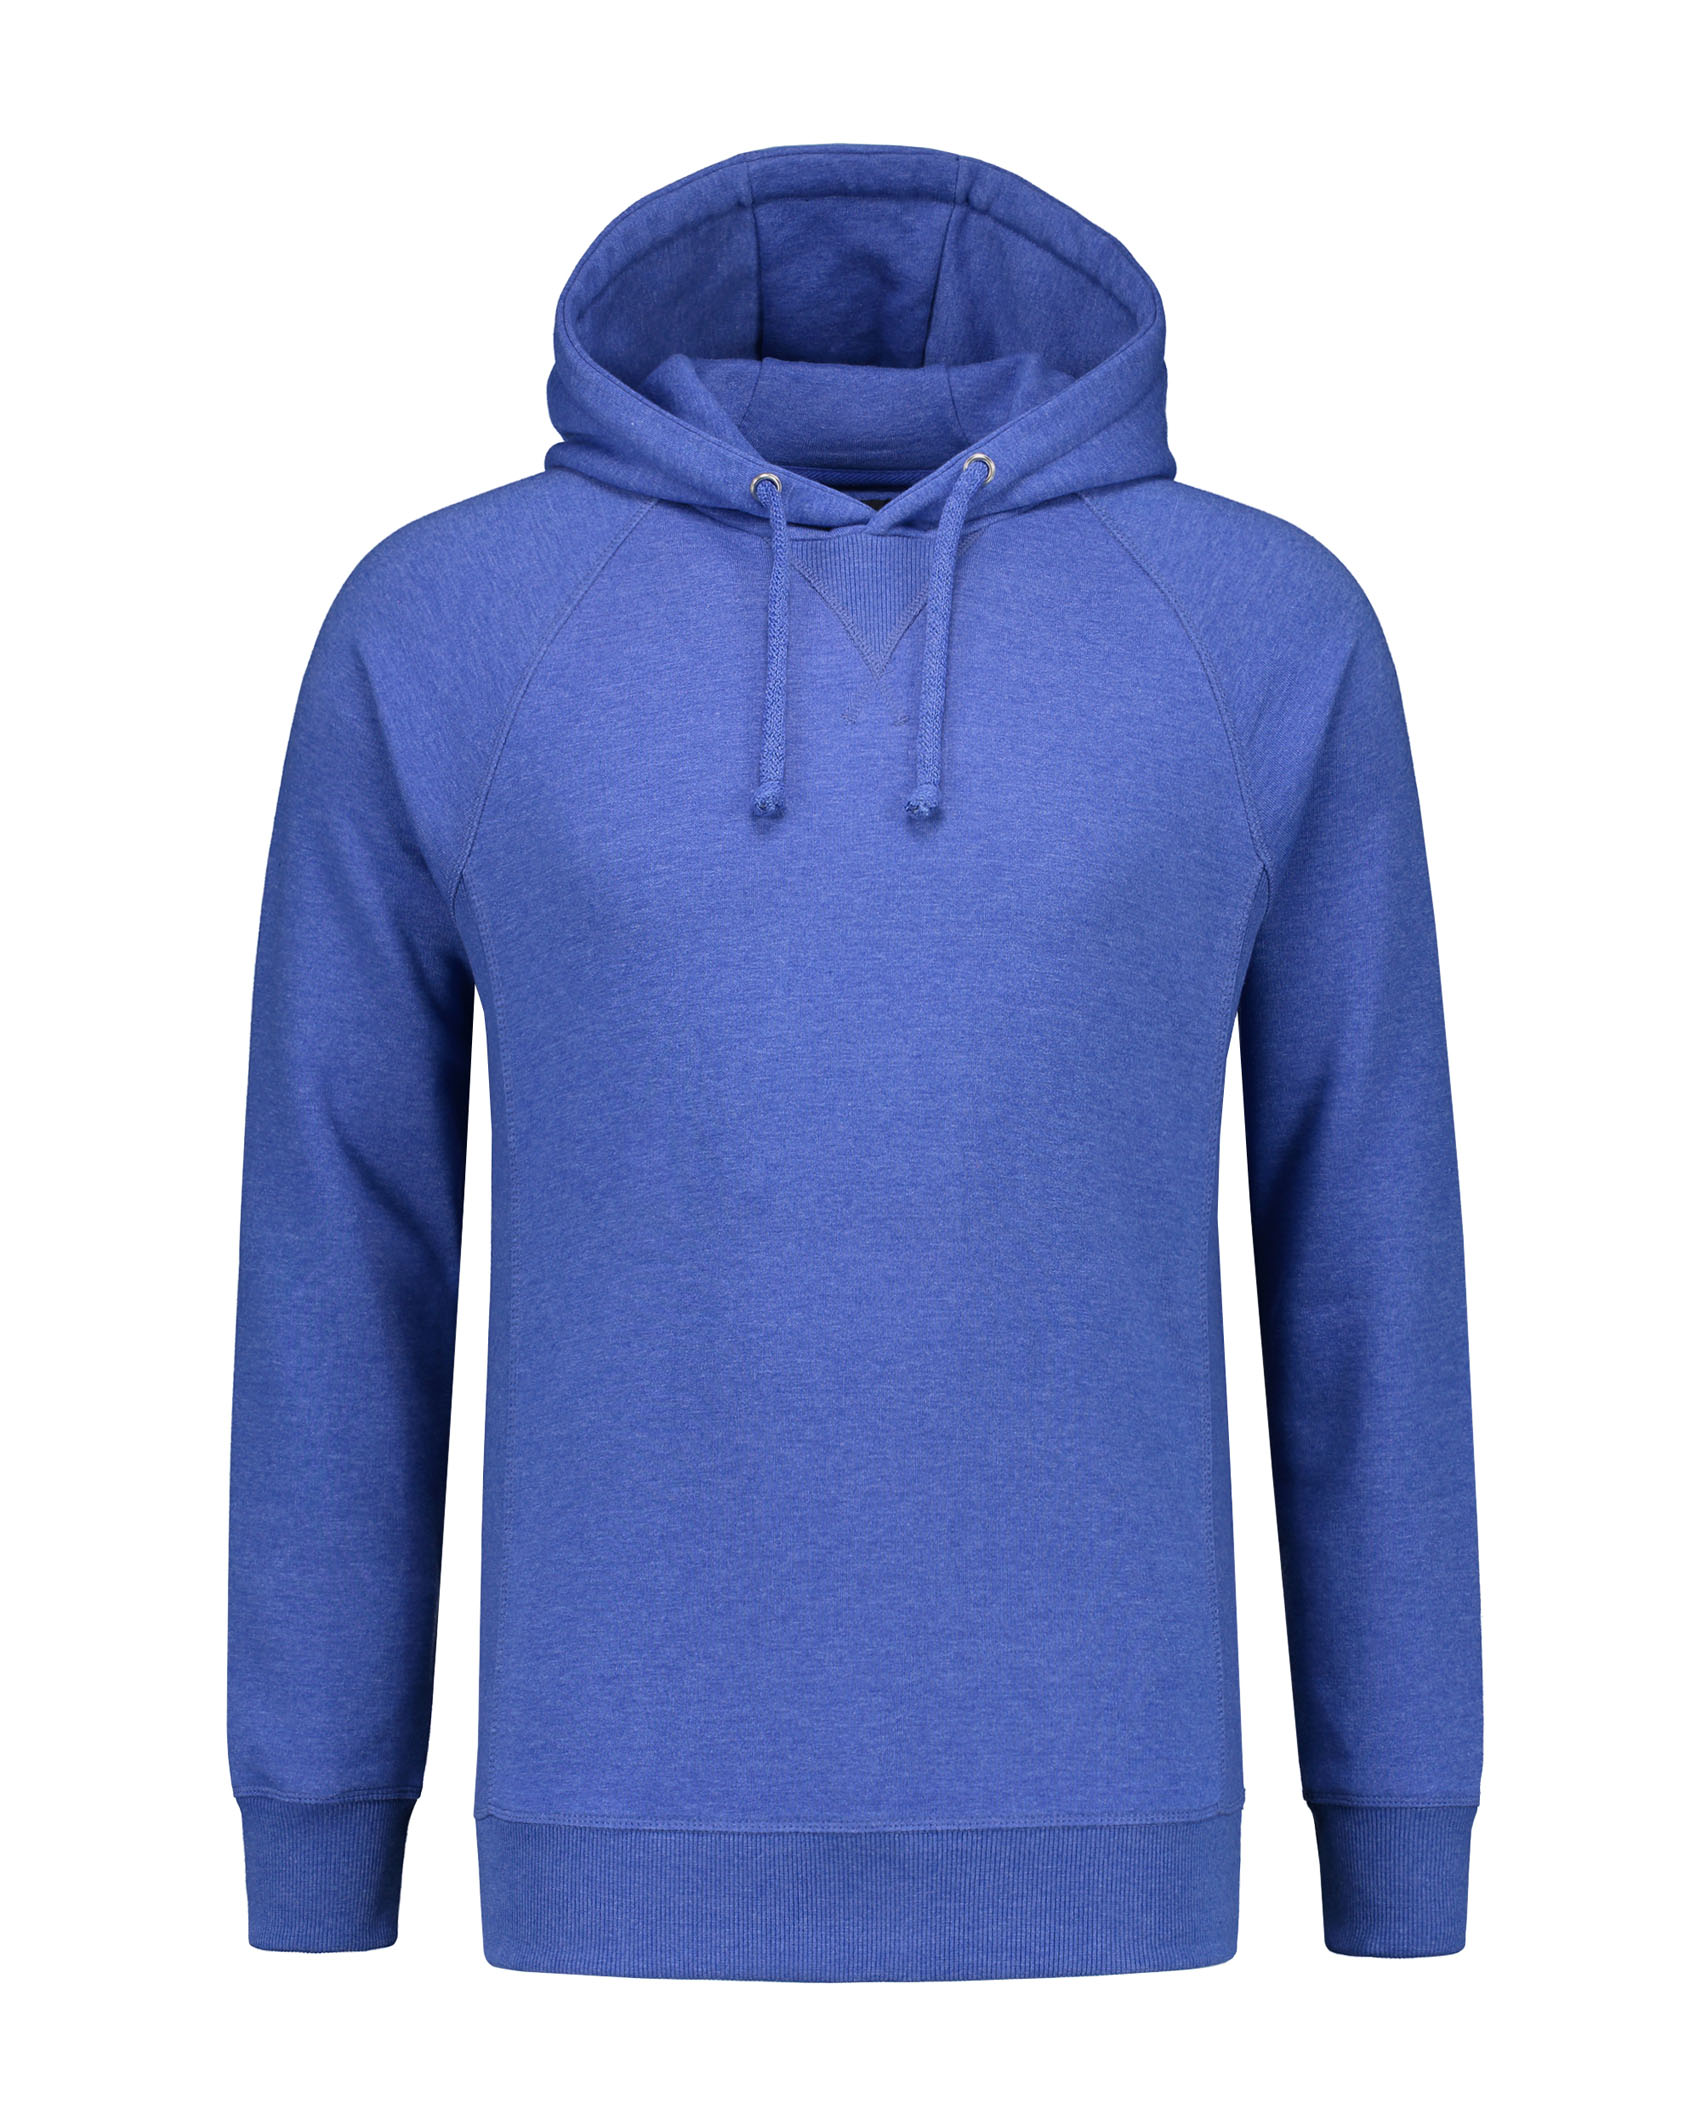 royal blue heather